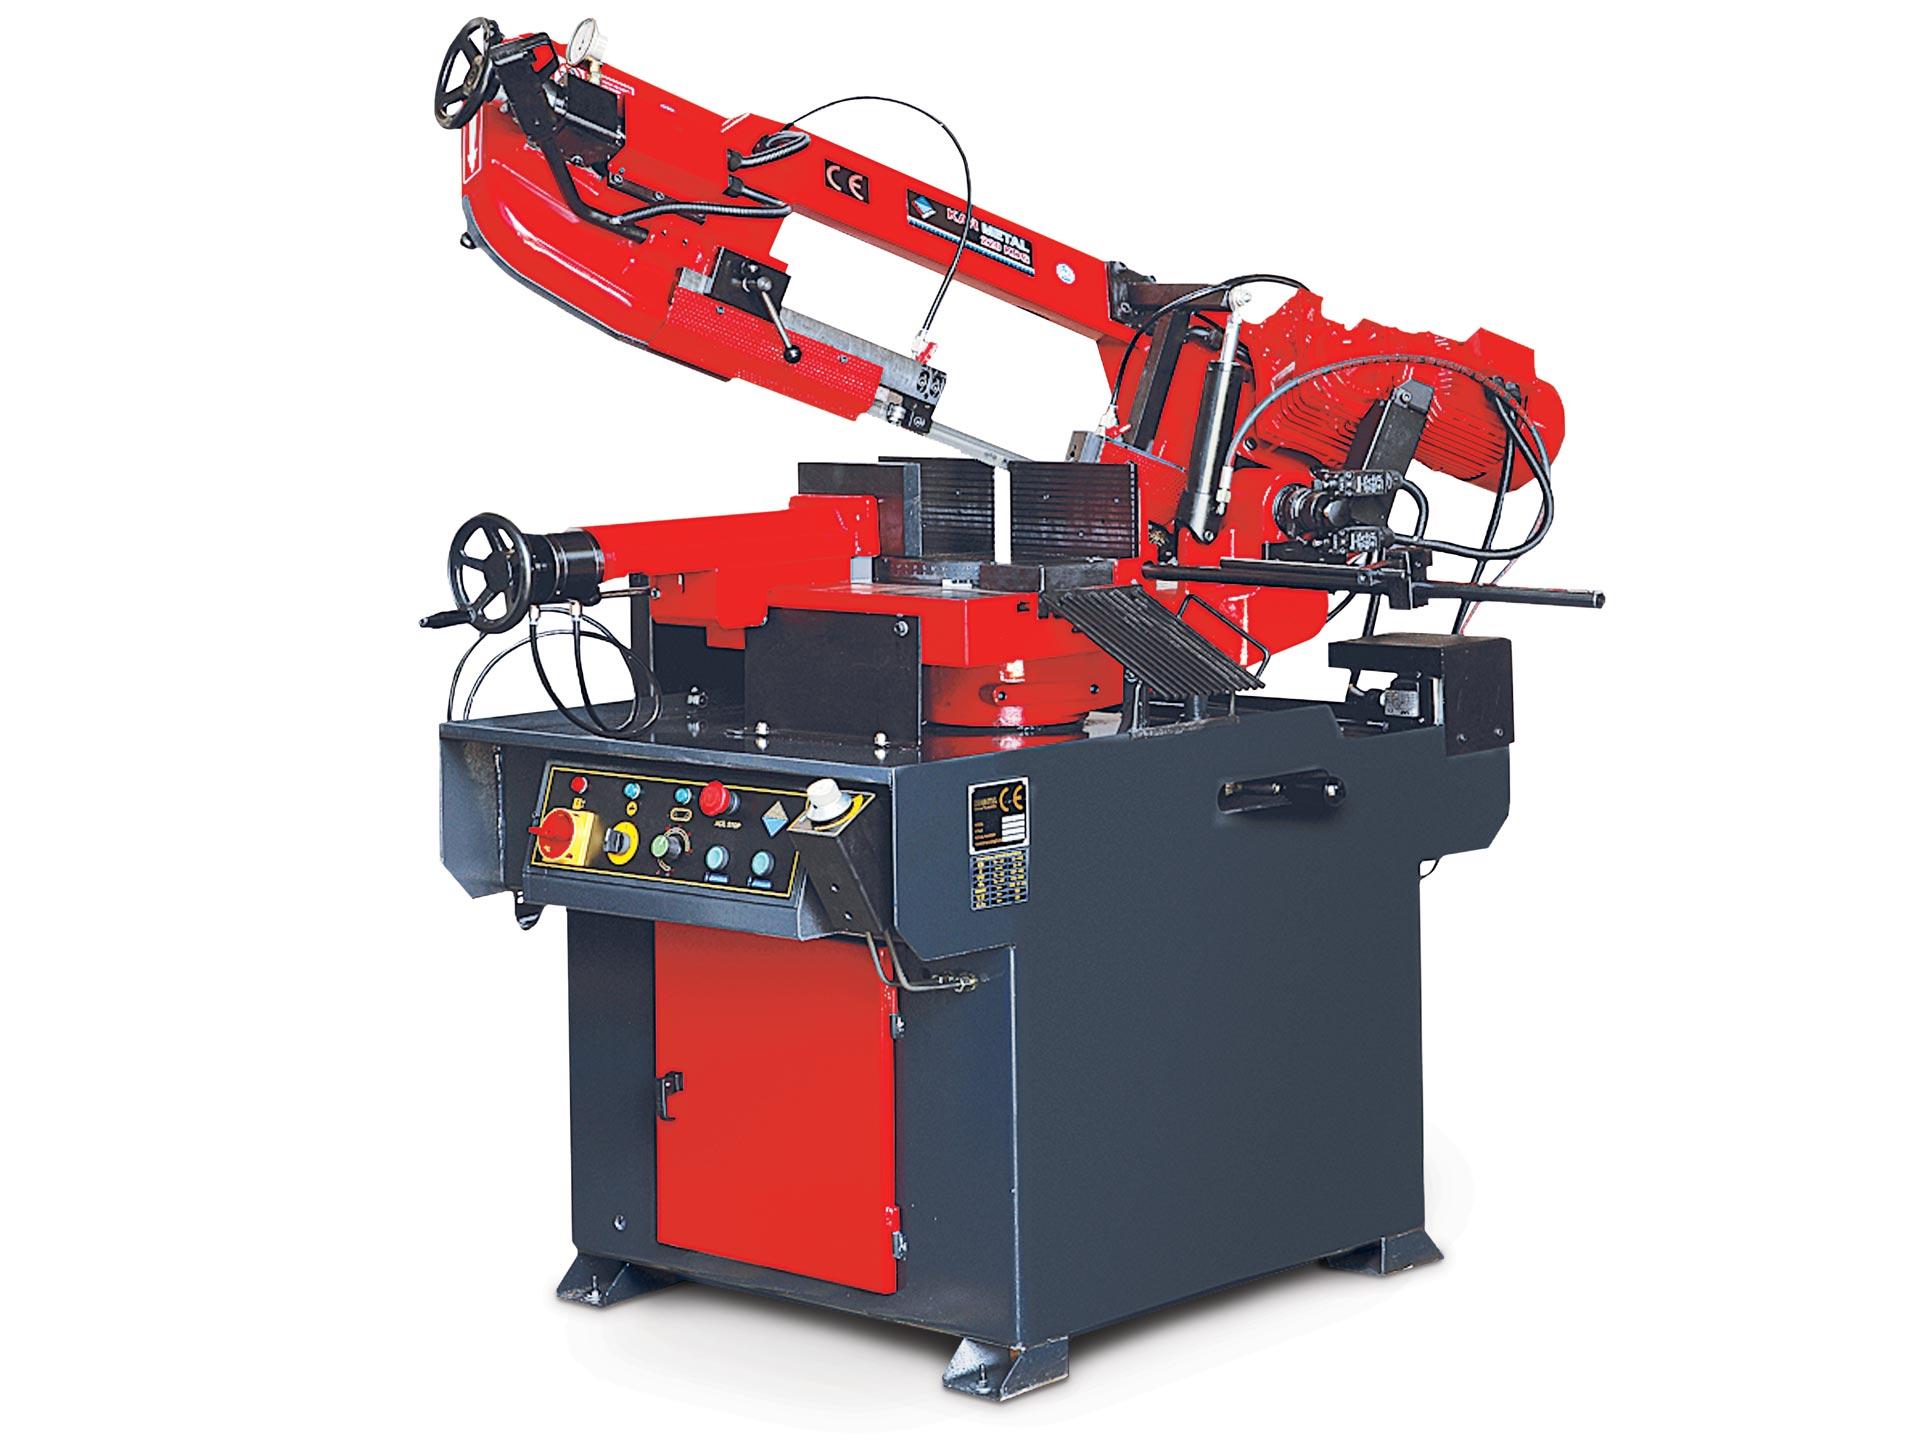 Spinner AG - Halbautomatische Bandsägemaschine Karmetal KMT 220 KDG